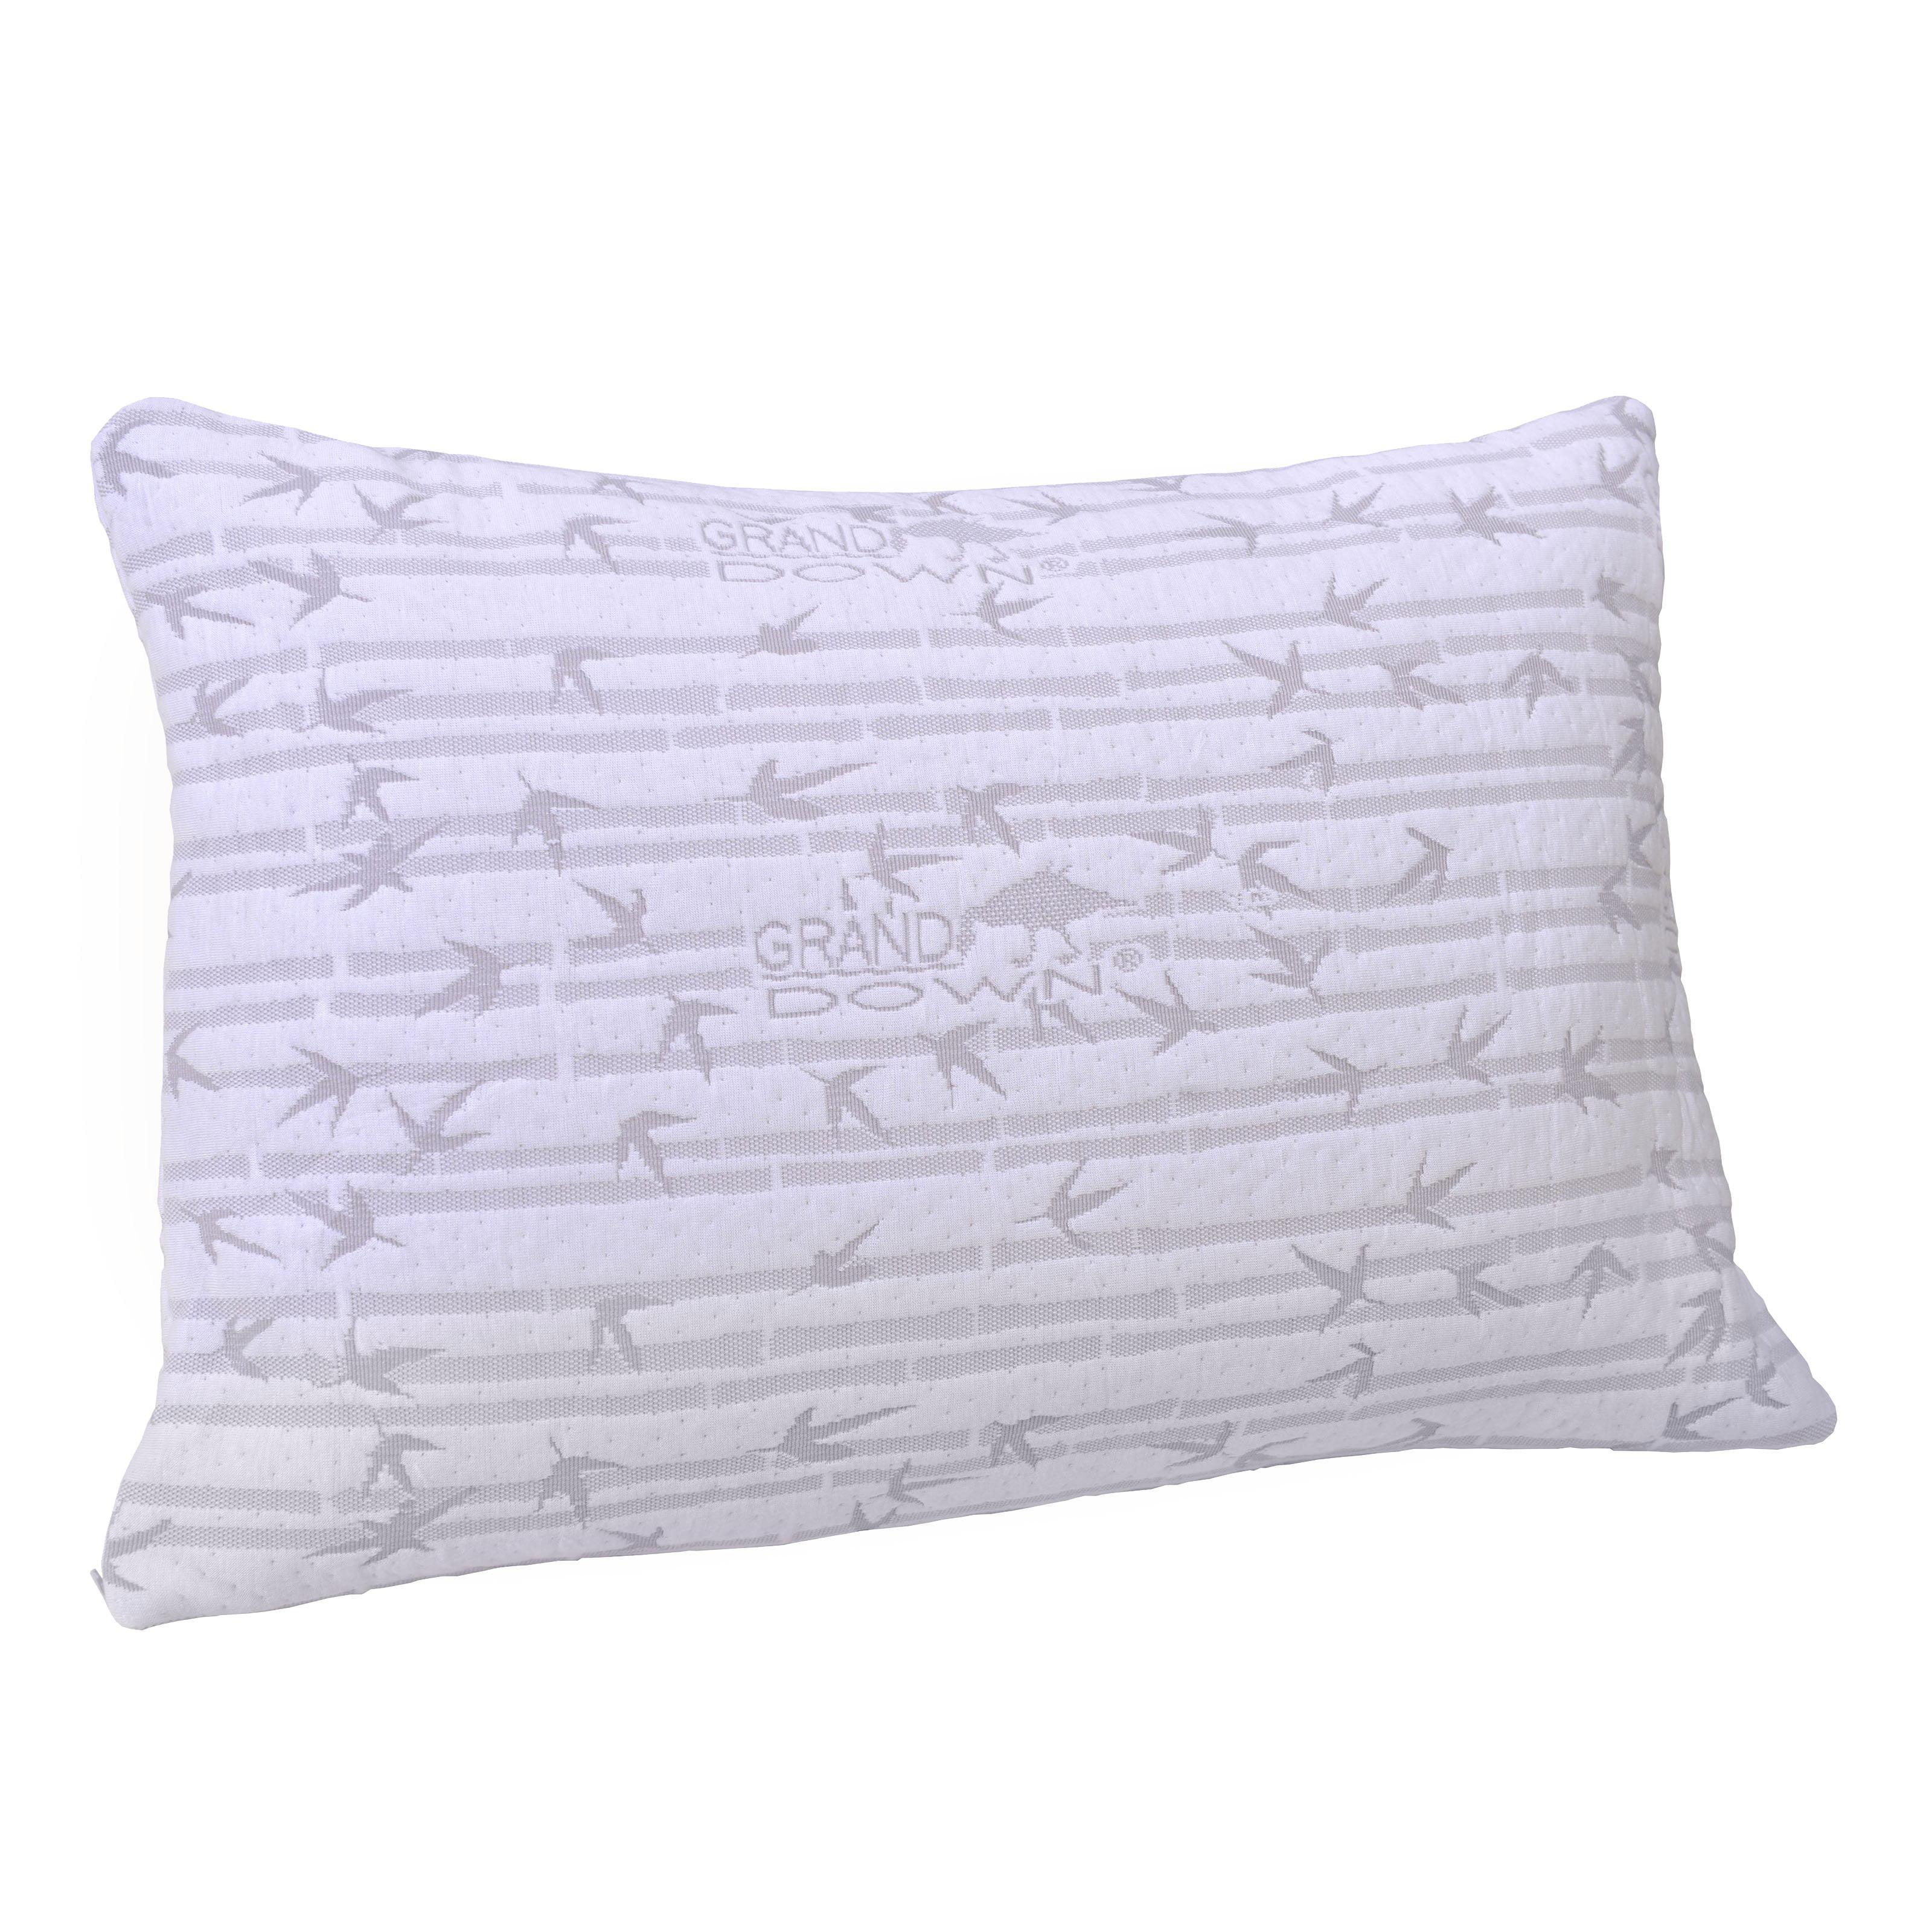 memory foam bamboo ip botanical com reviews comfort walmart pillow